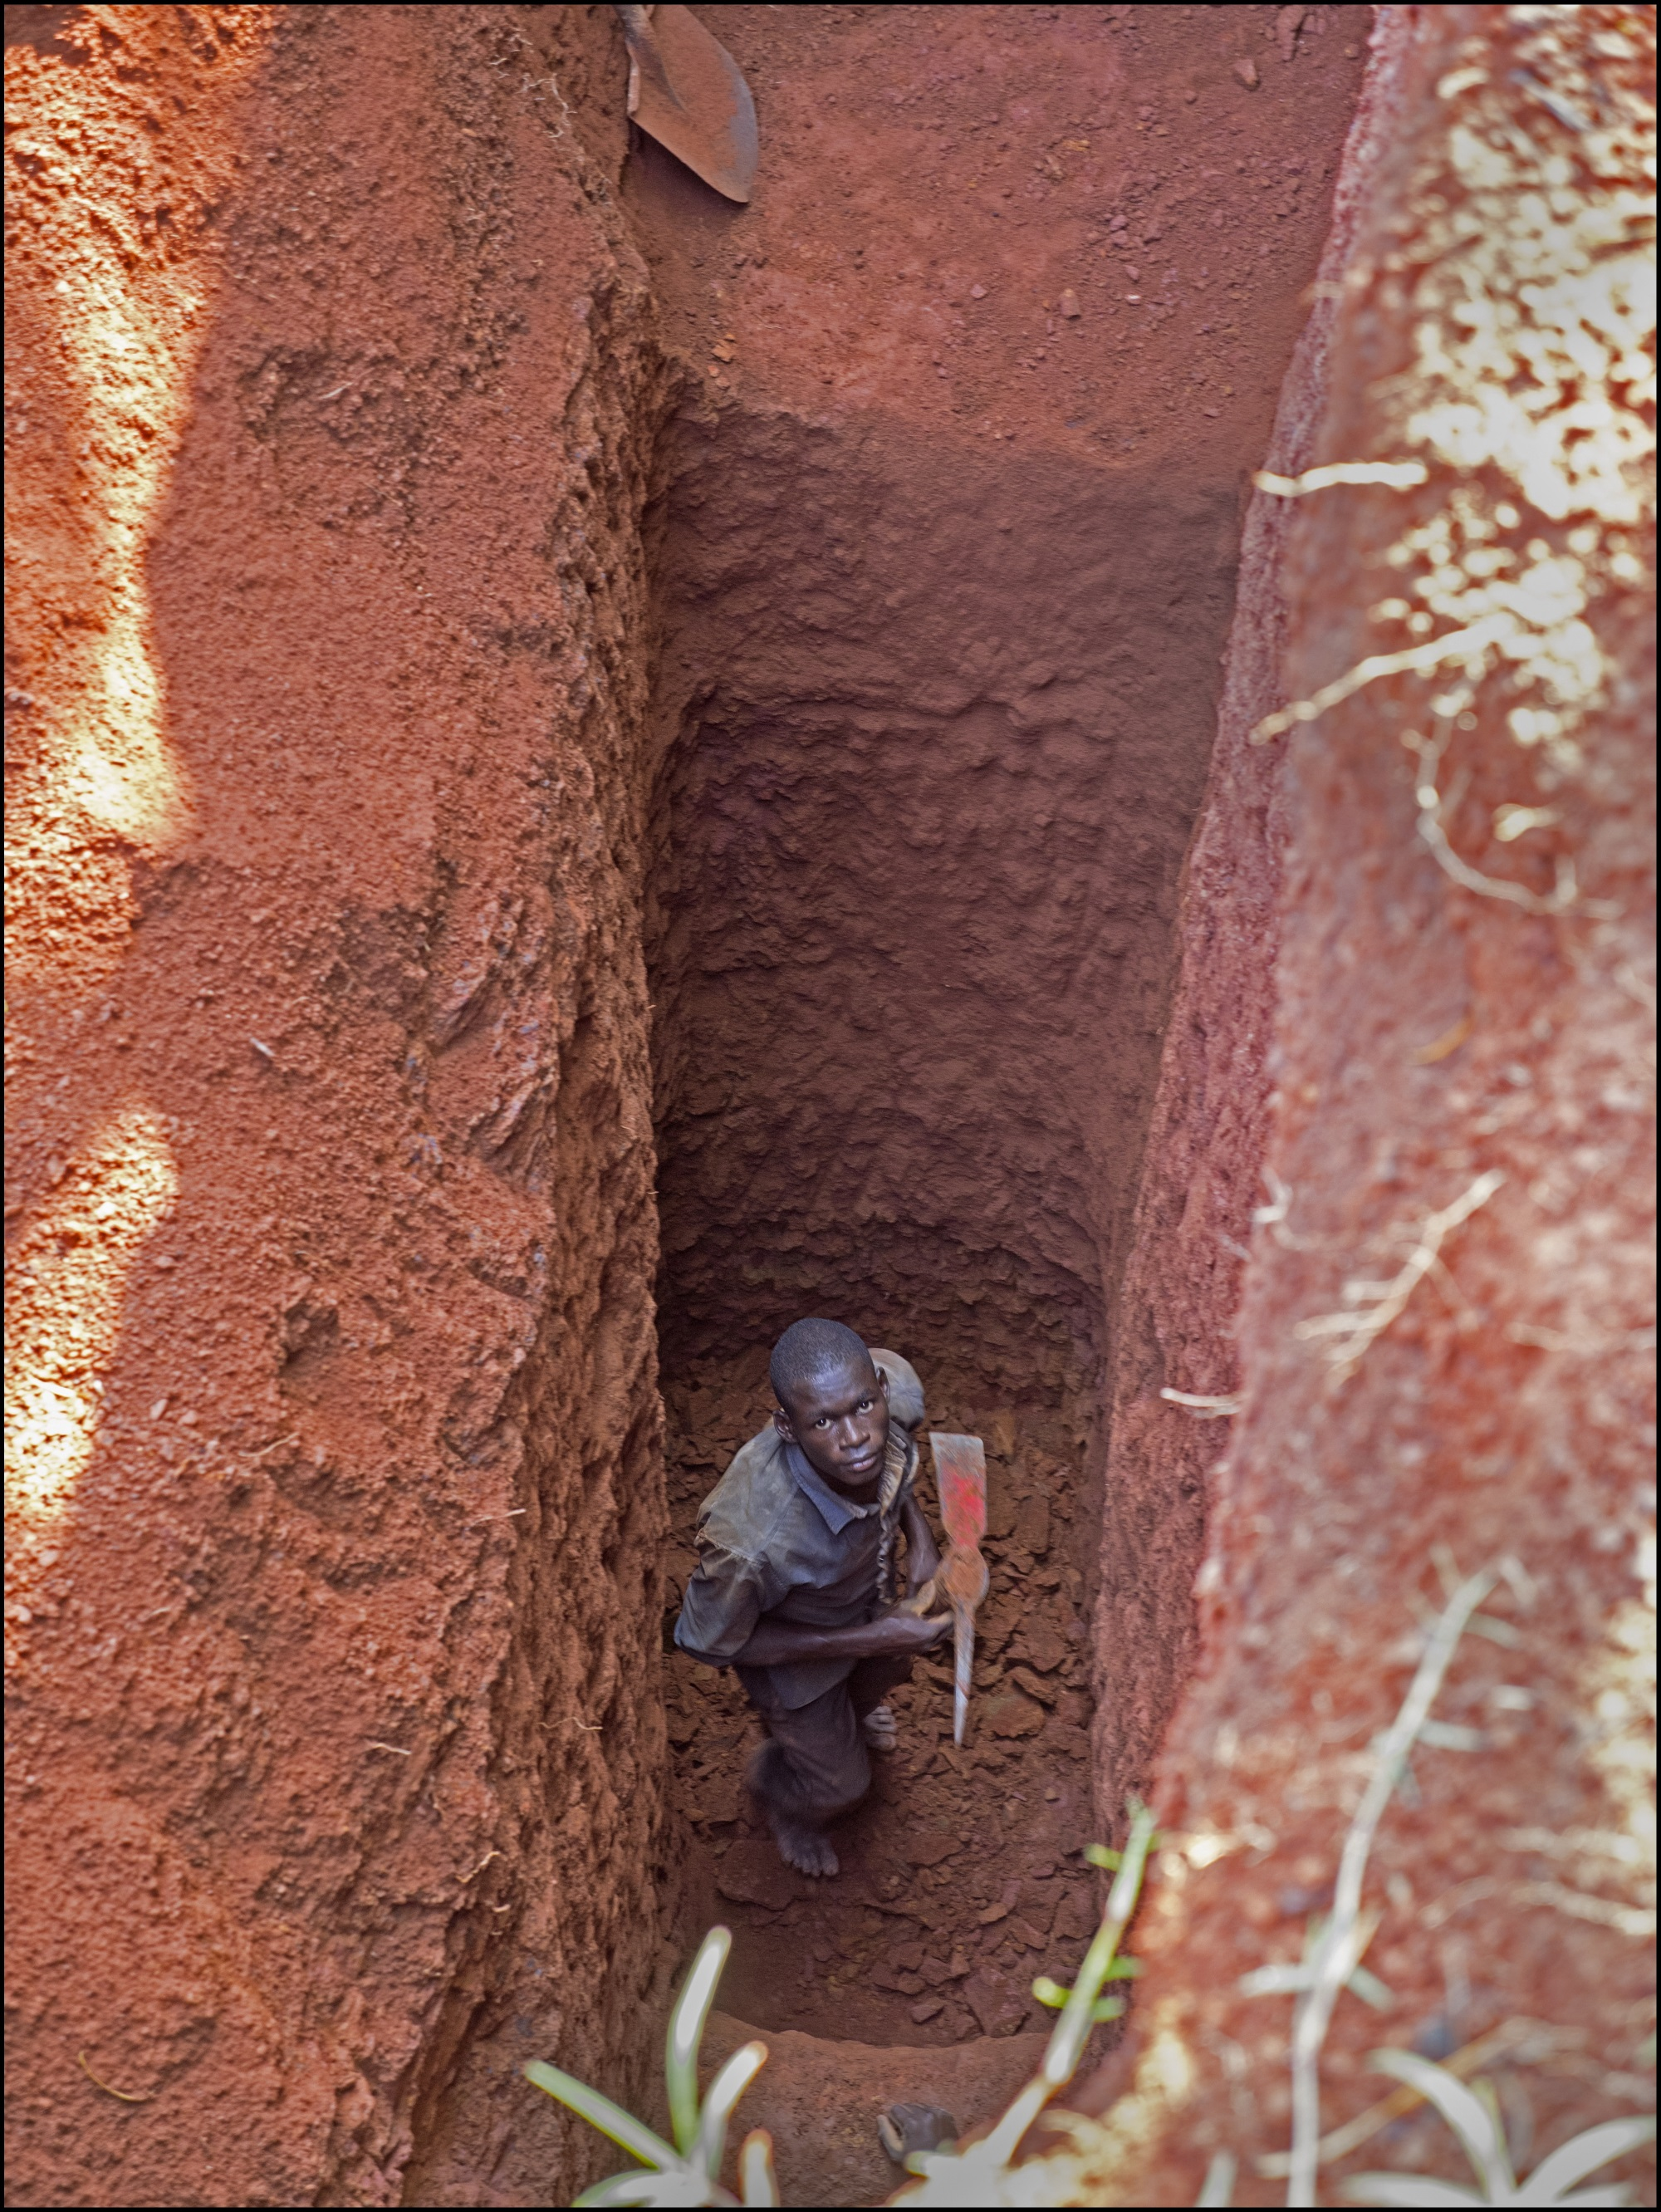 An artisanal gold miner (Photo credit:  Fairtrade UK )